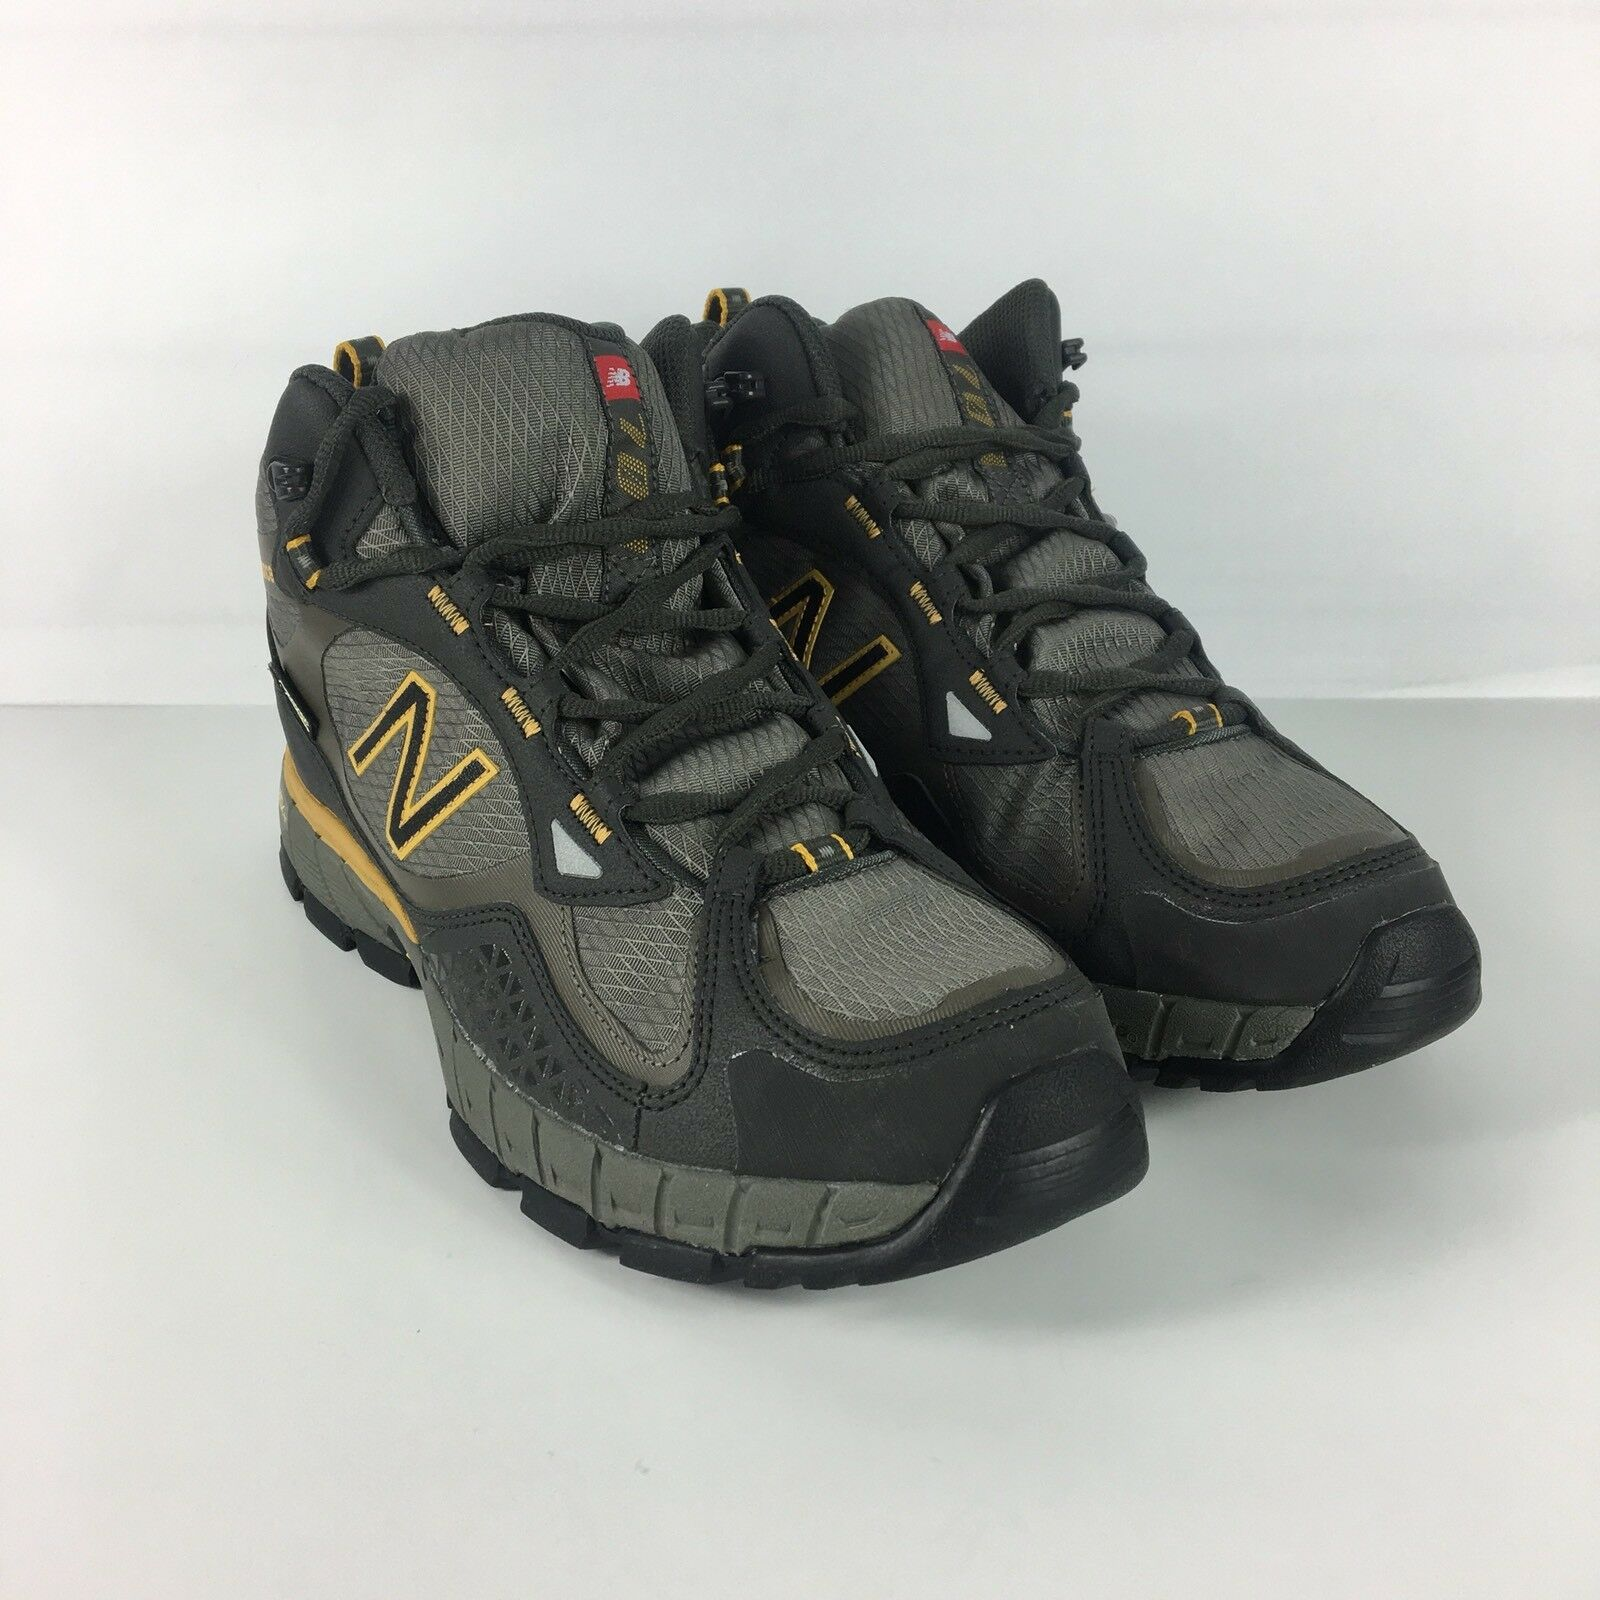 New Balance 703 Gore Tex Mens SZ 8 Hiking Boots Shoes Vibram Olive Green Black